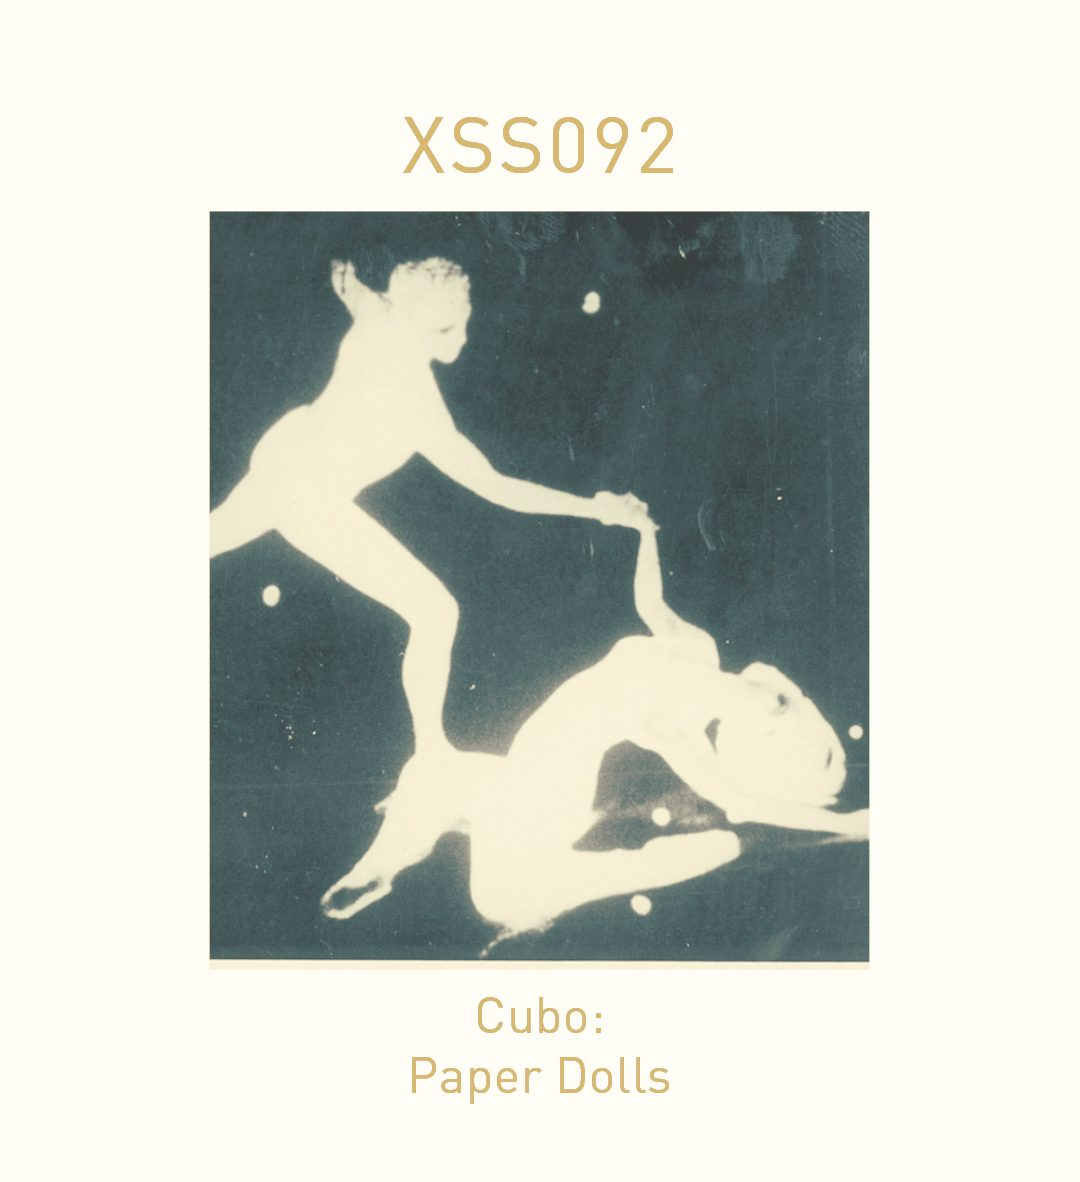 XSS092   Cubo   Paper Dolls